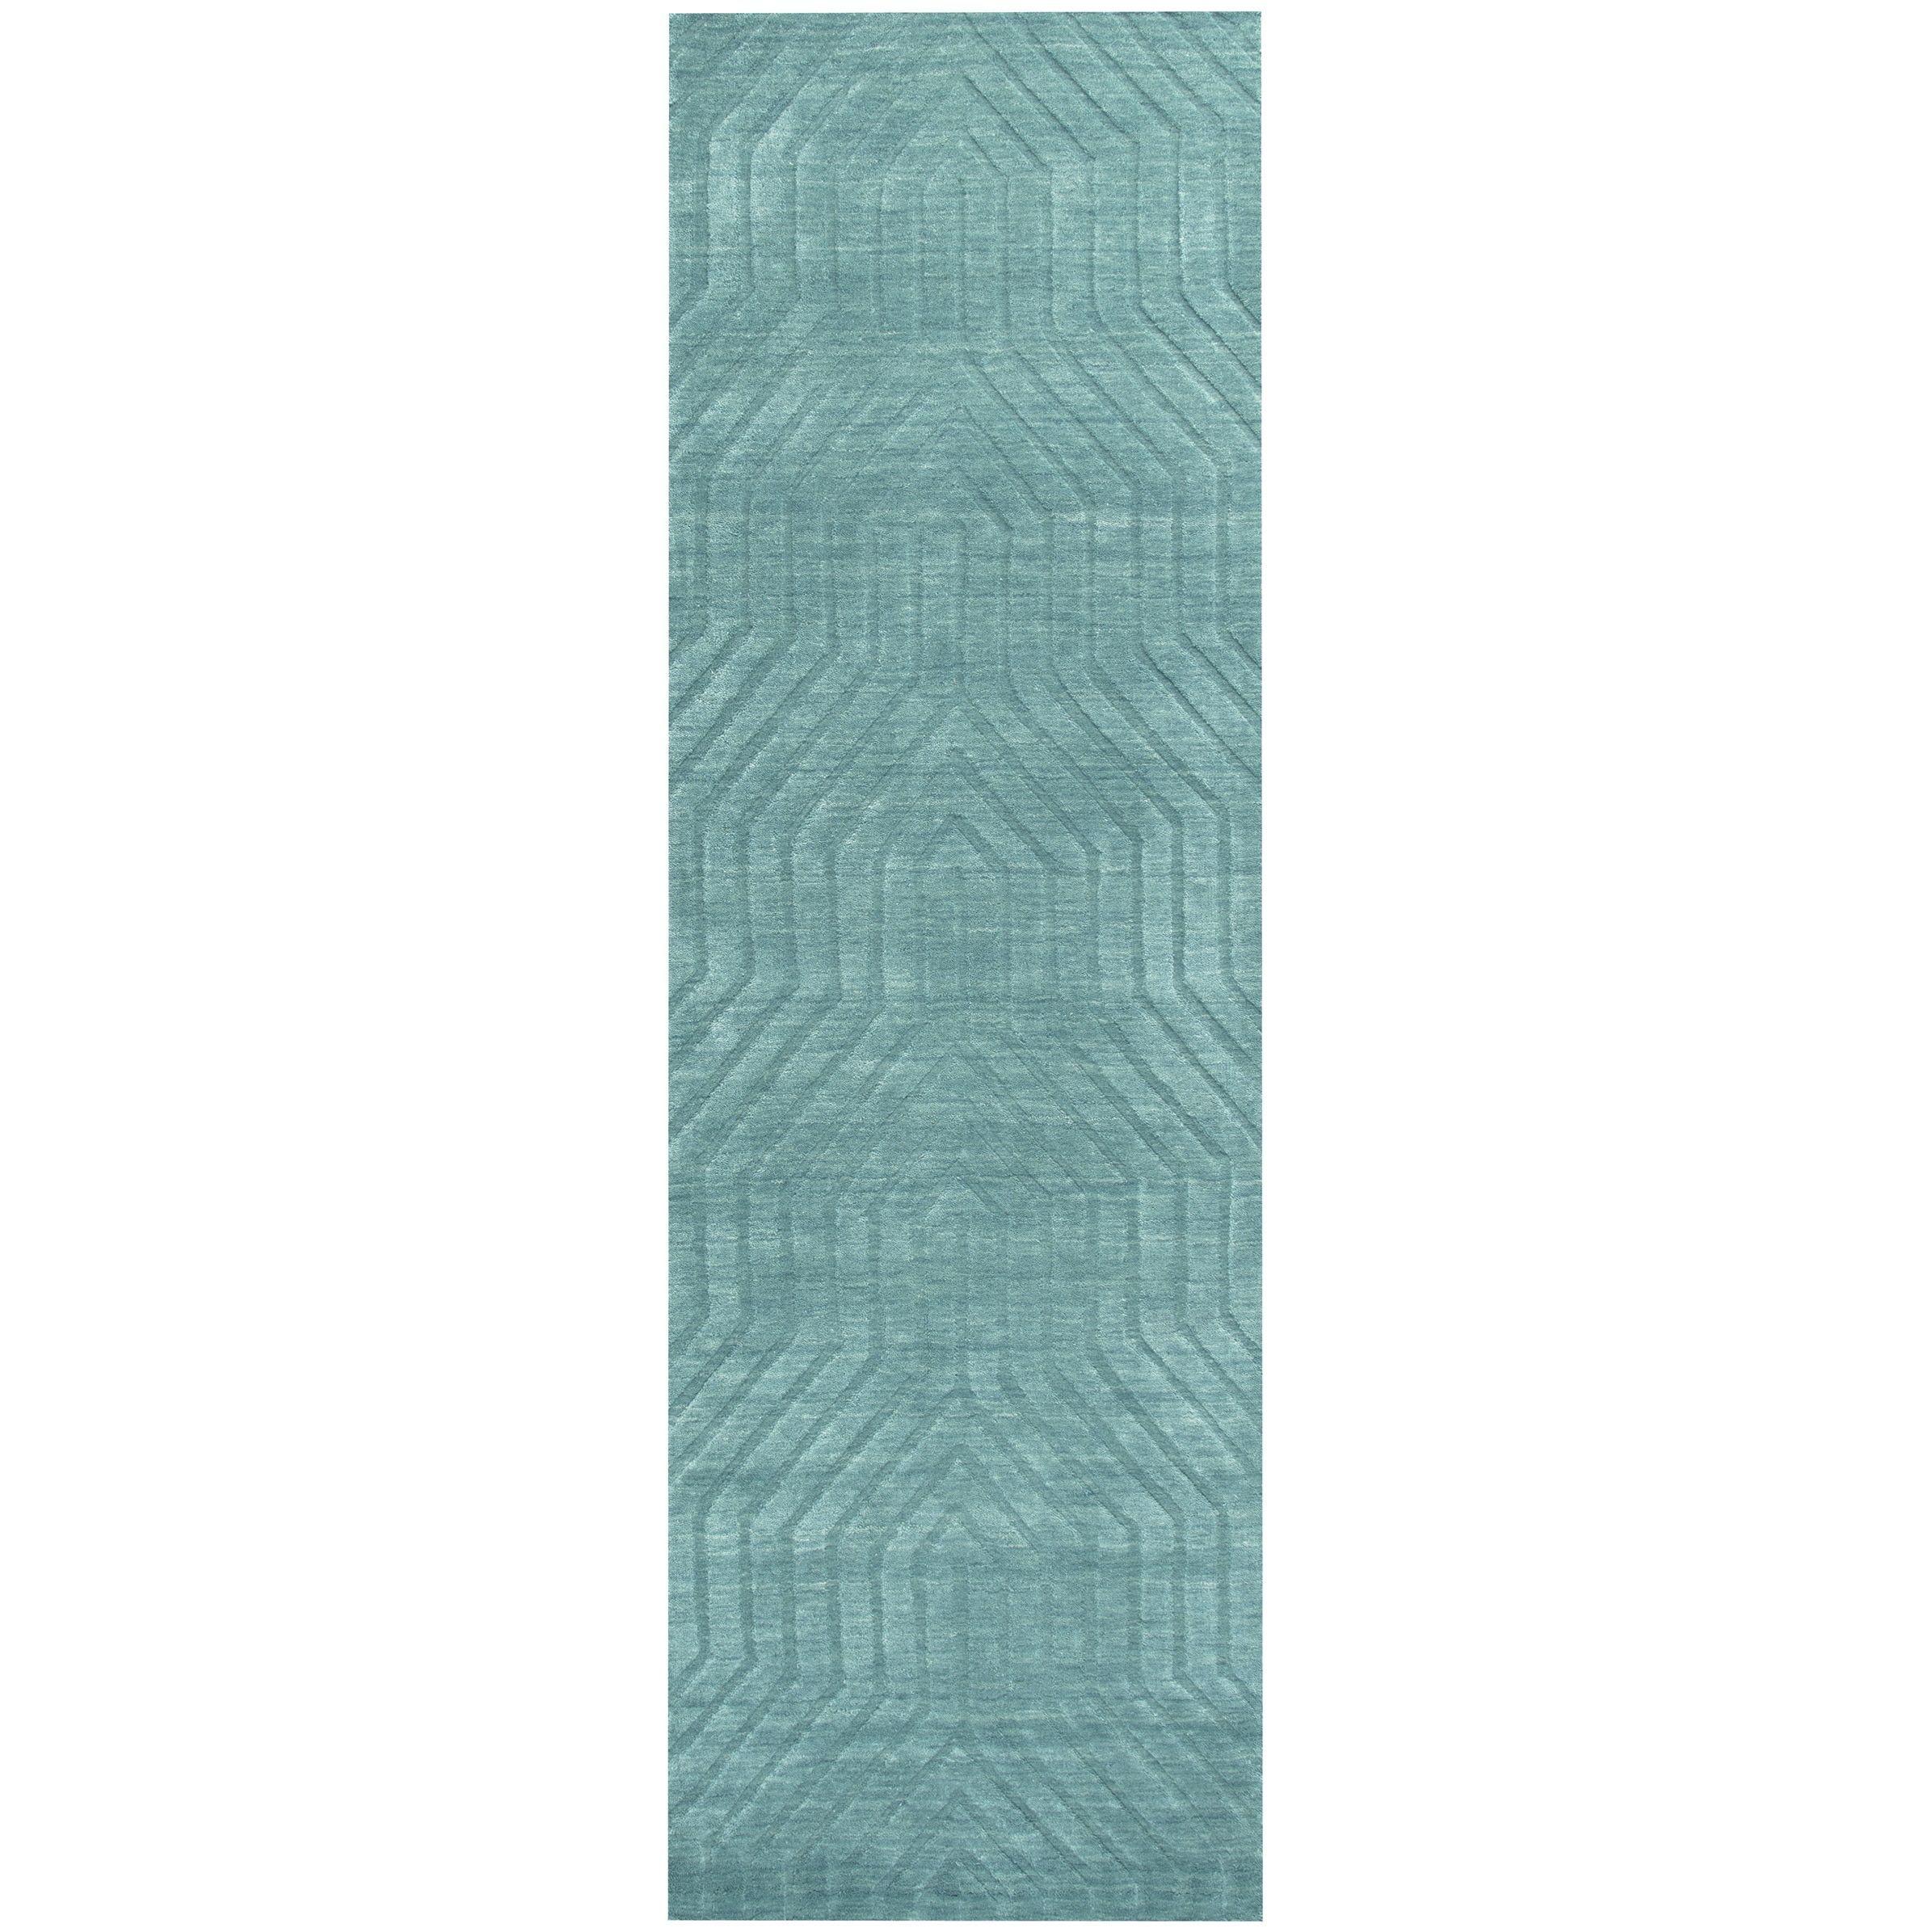 Hand Loomed Technique Blue Dark Teal Wool Solid Runner Area Rug 2 6 X 8 2 6 X 8 Wool Area Rugs Rugs Rug Runner